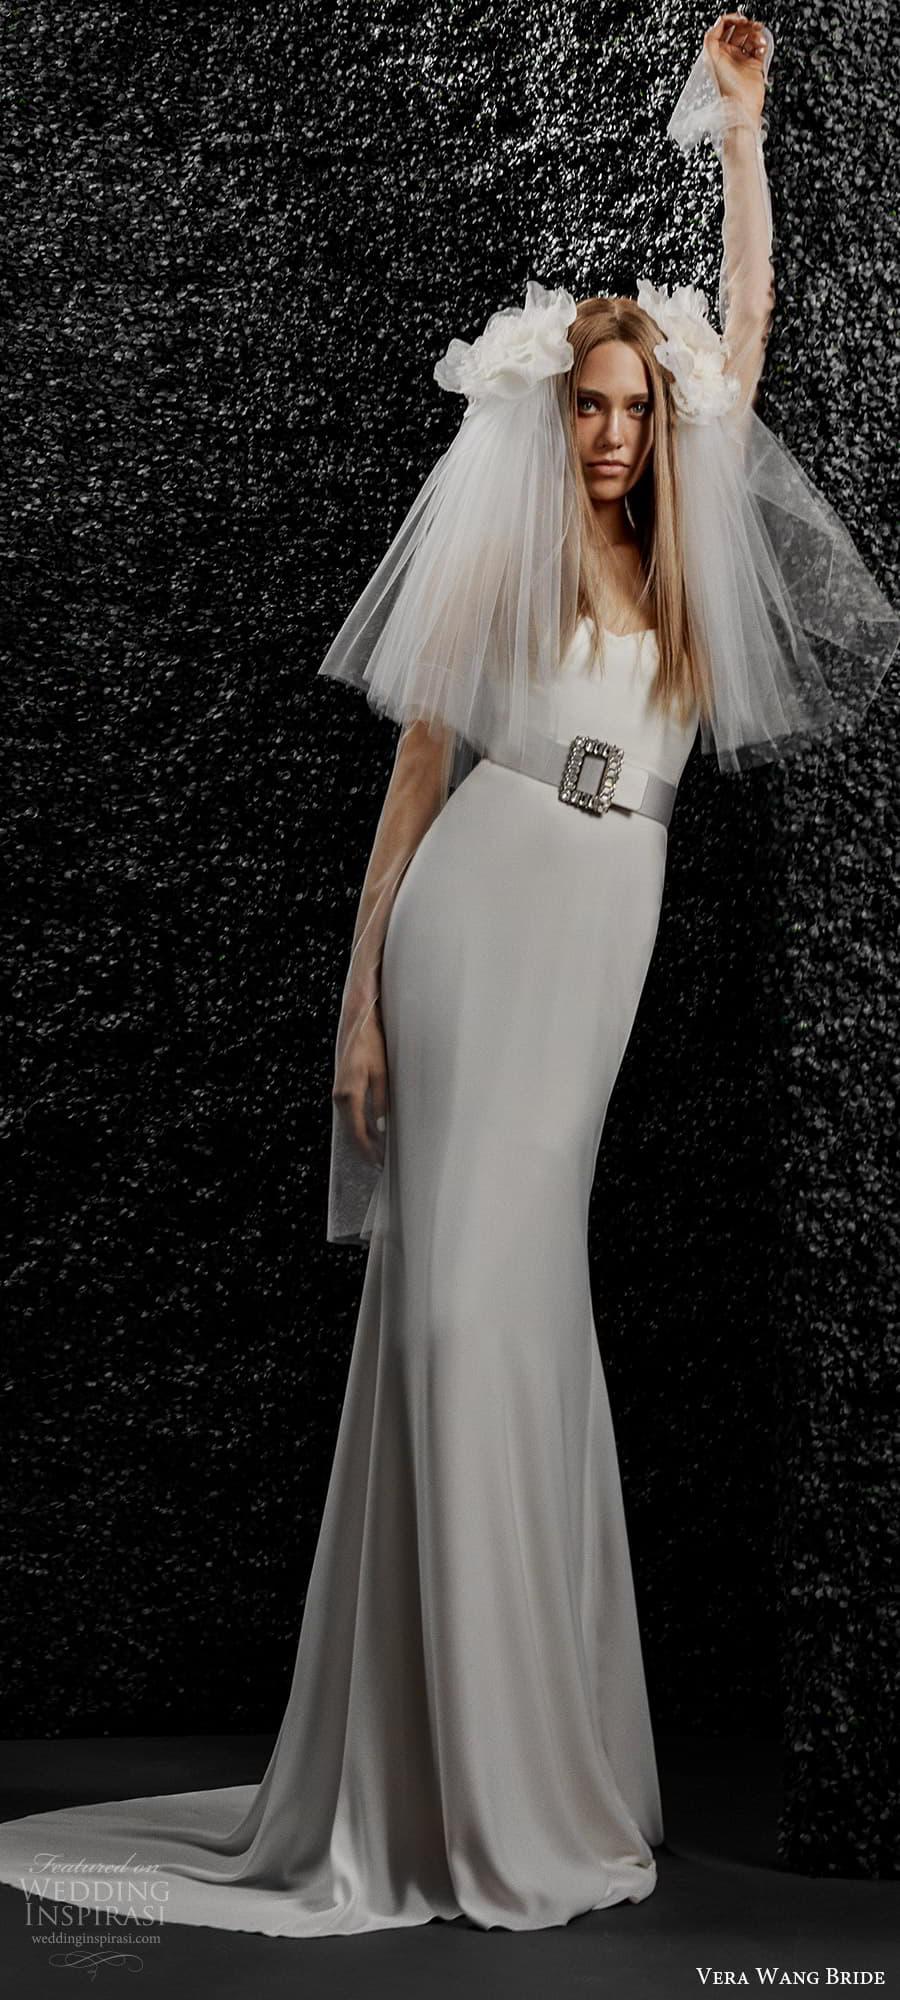 vera wang bride pronovias fall 2021 bridal strapless sweetheart neckline clean minimalist sheath wedding dress chapel train (34) mv